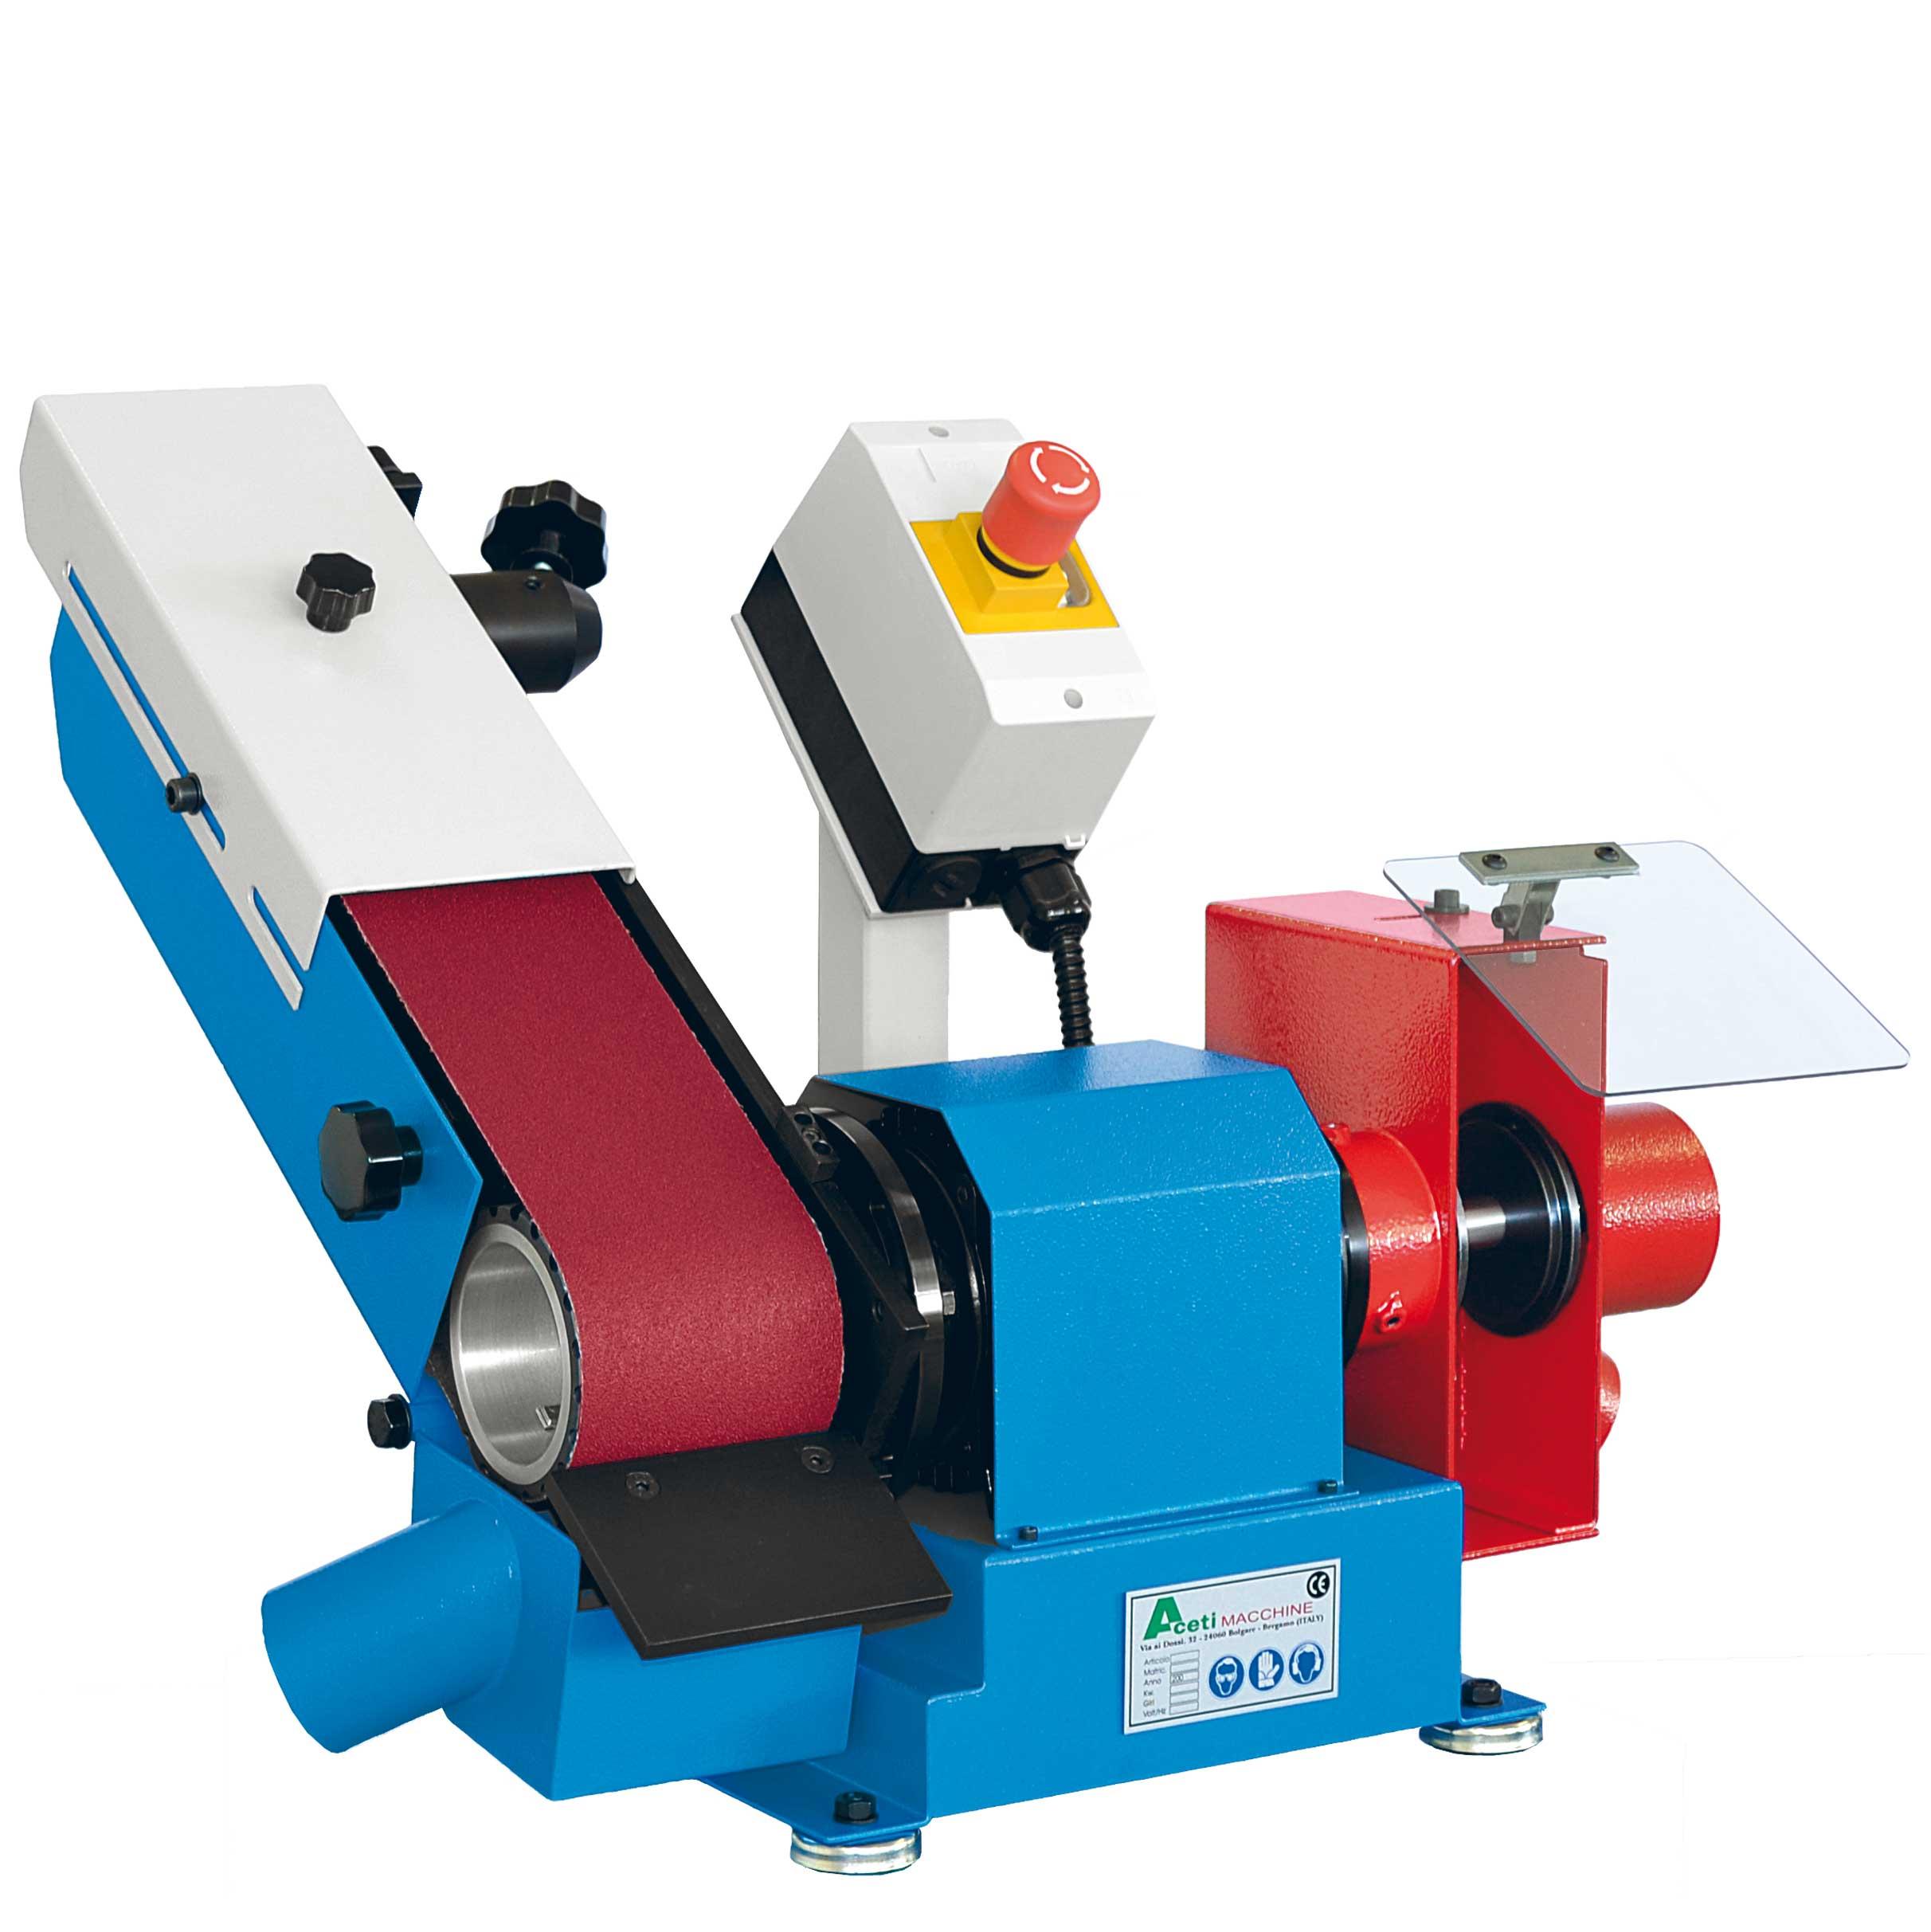 ART.89 - Belt grinding machine